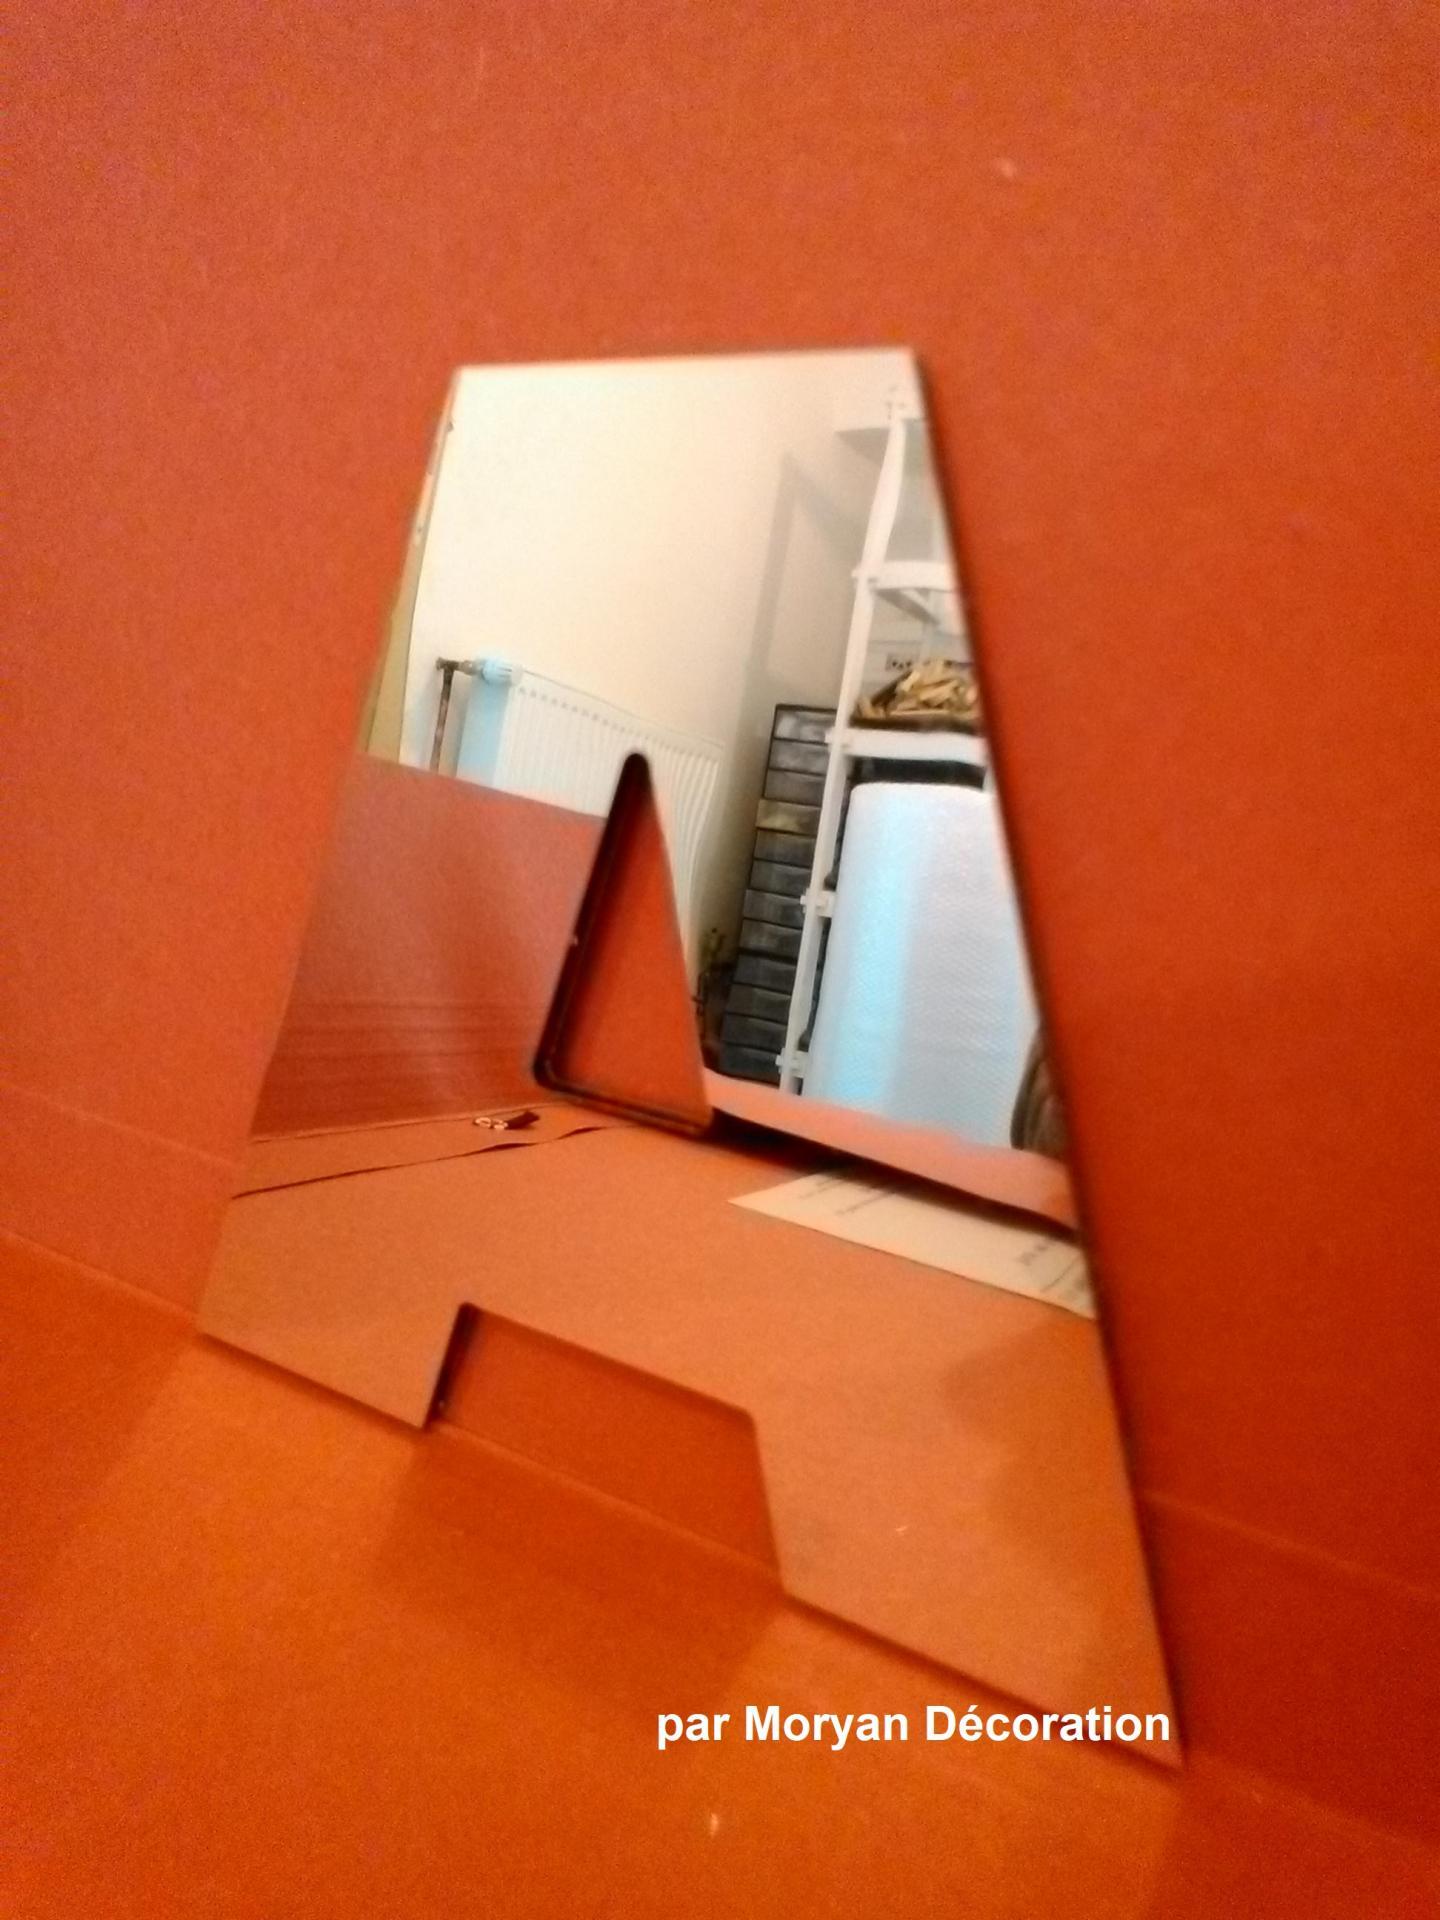 Lettre miroir arial black 3